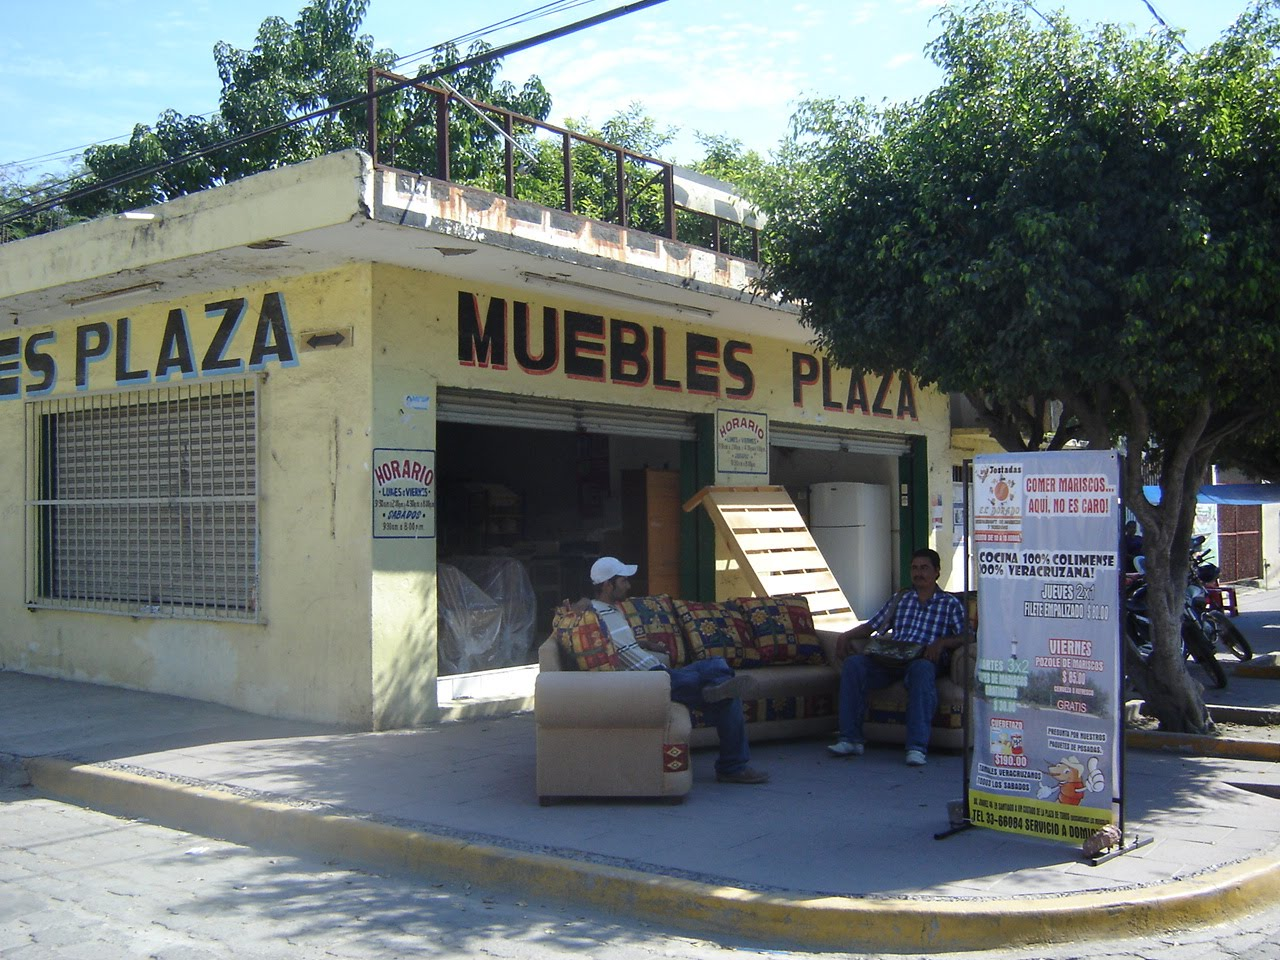 Muebles plaza hogar 20170909183357 for Muebles plaza norte